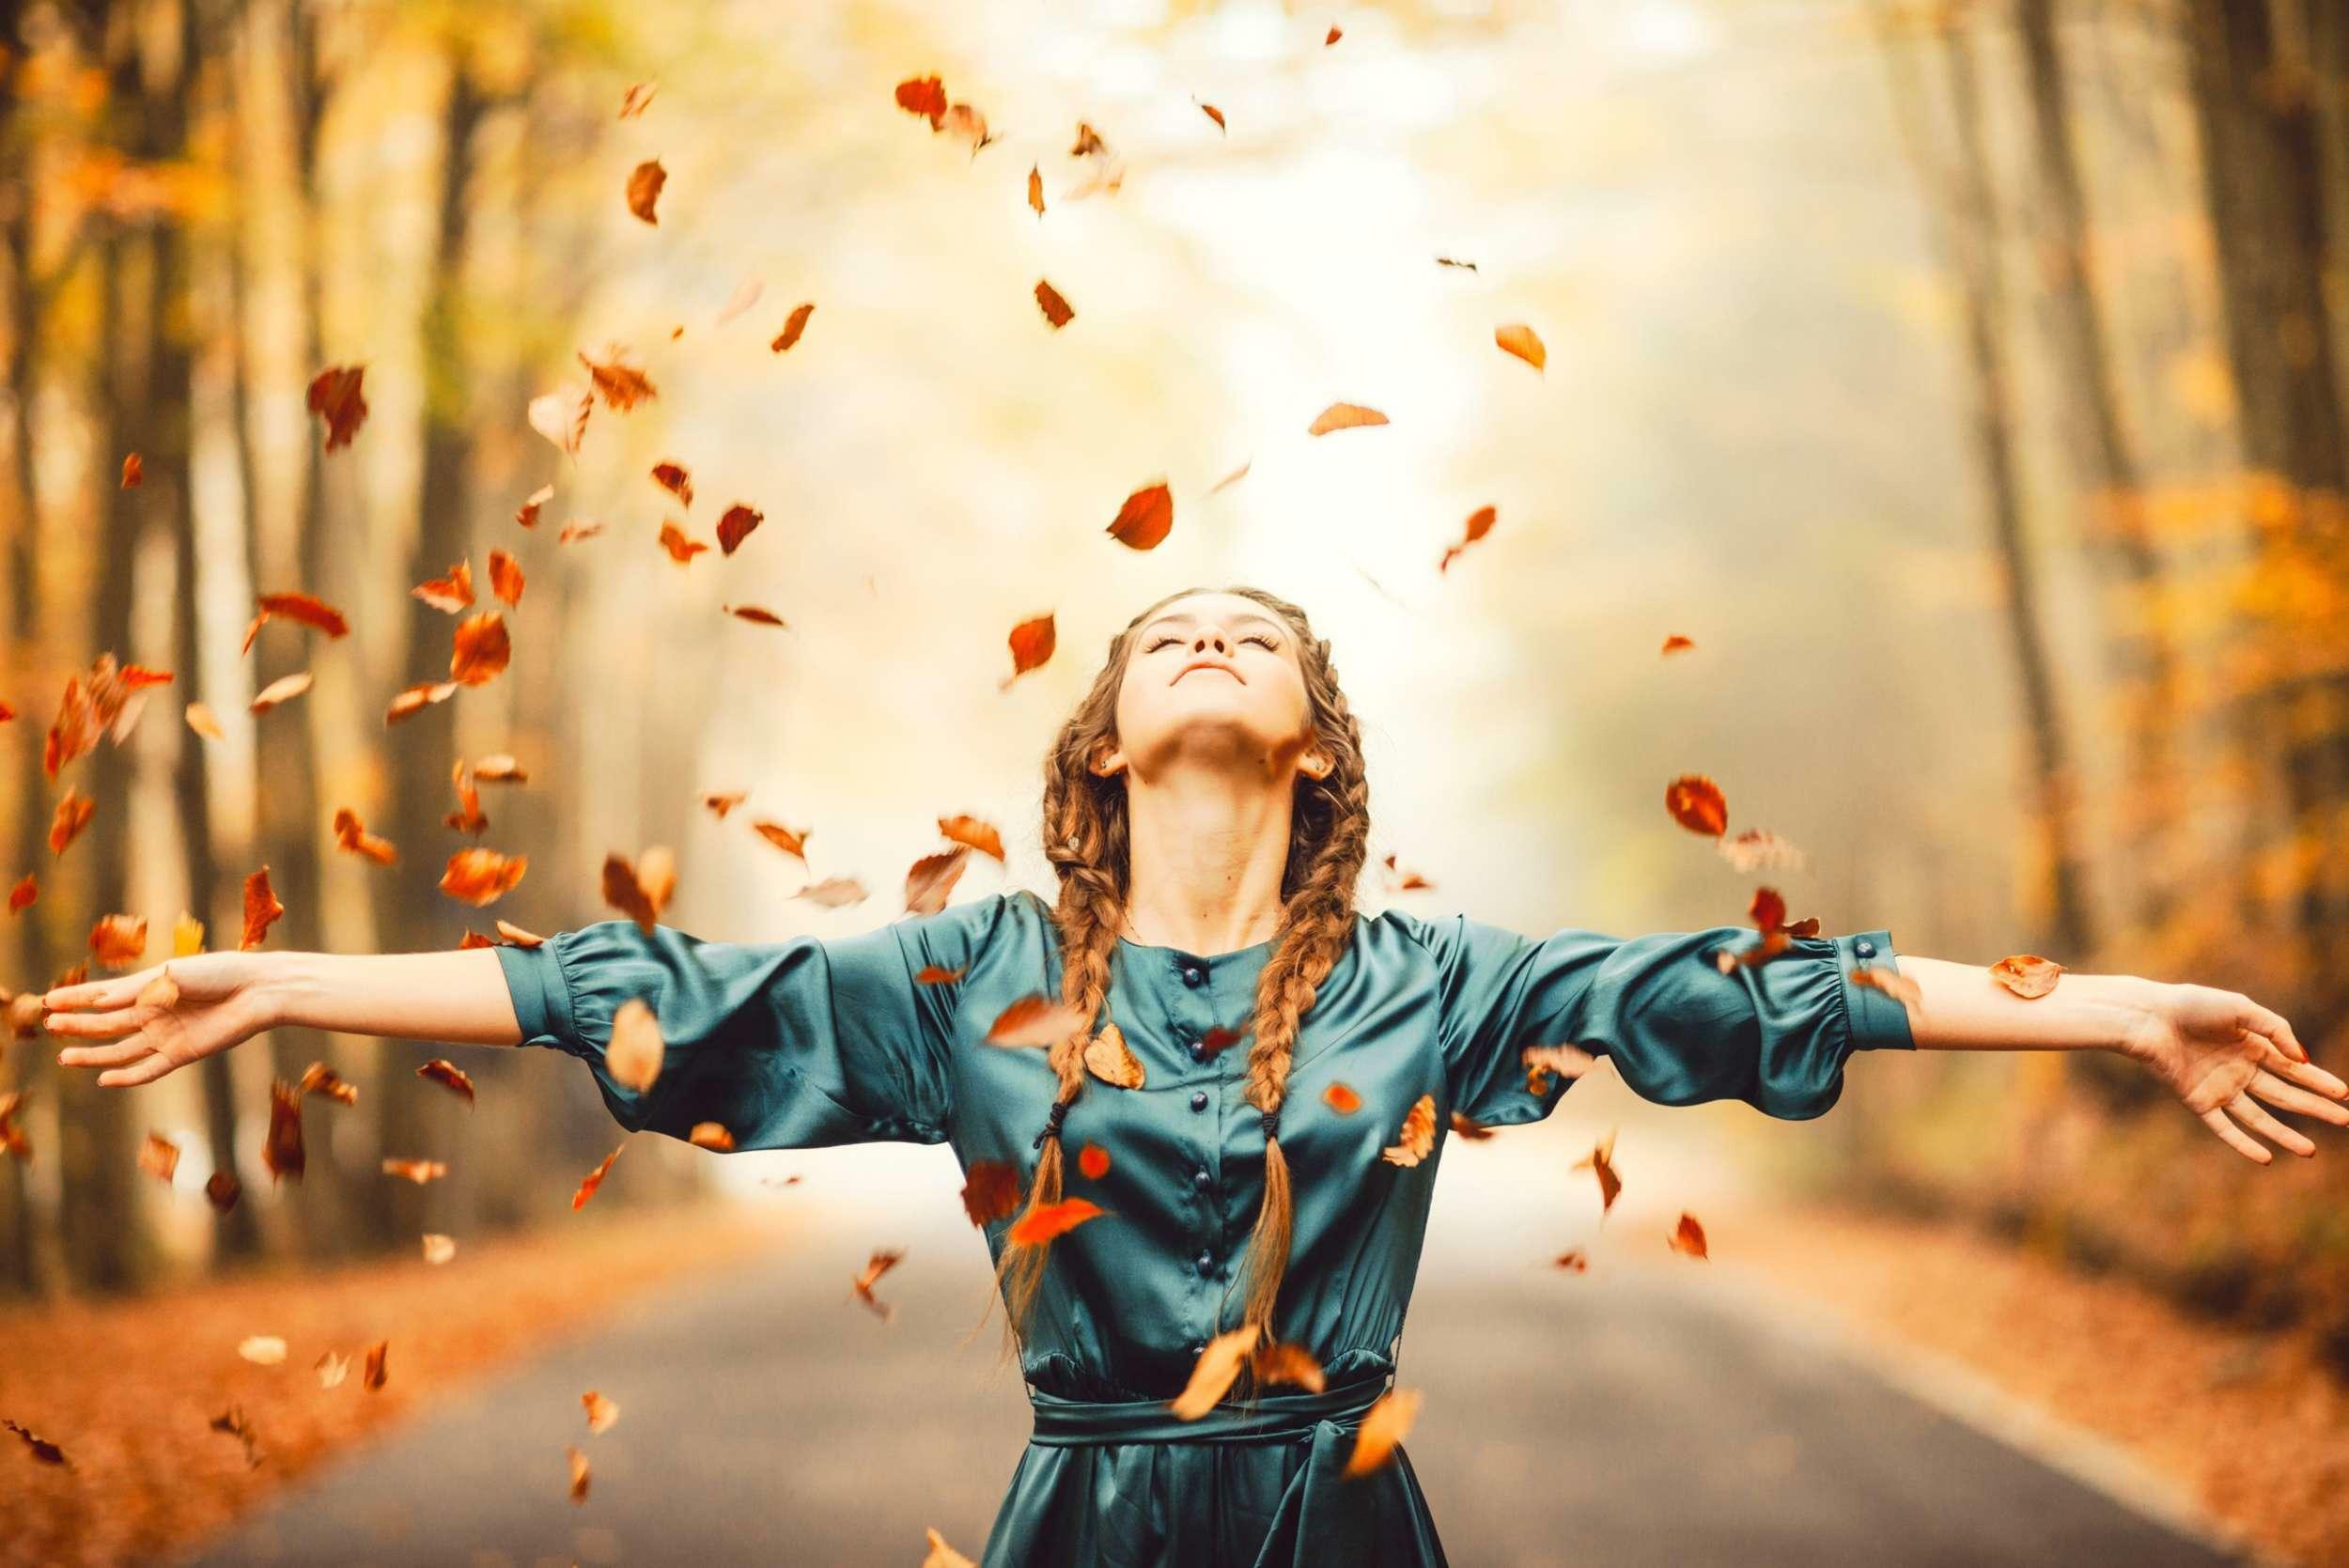 Оптимистичные картинки про осень на аву